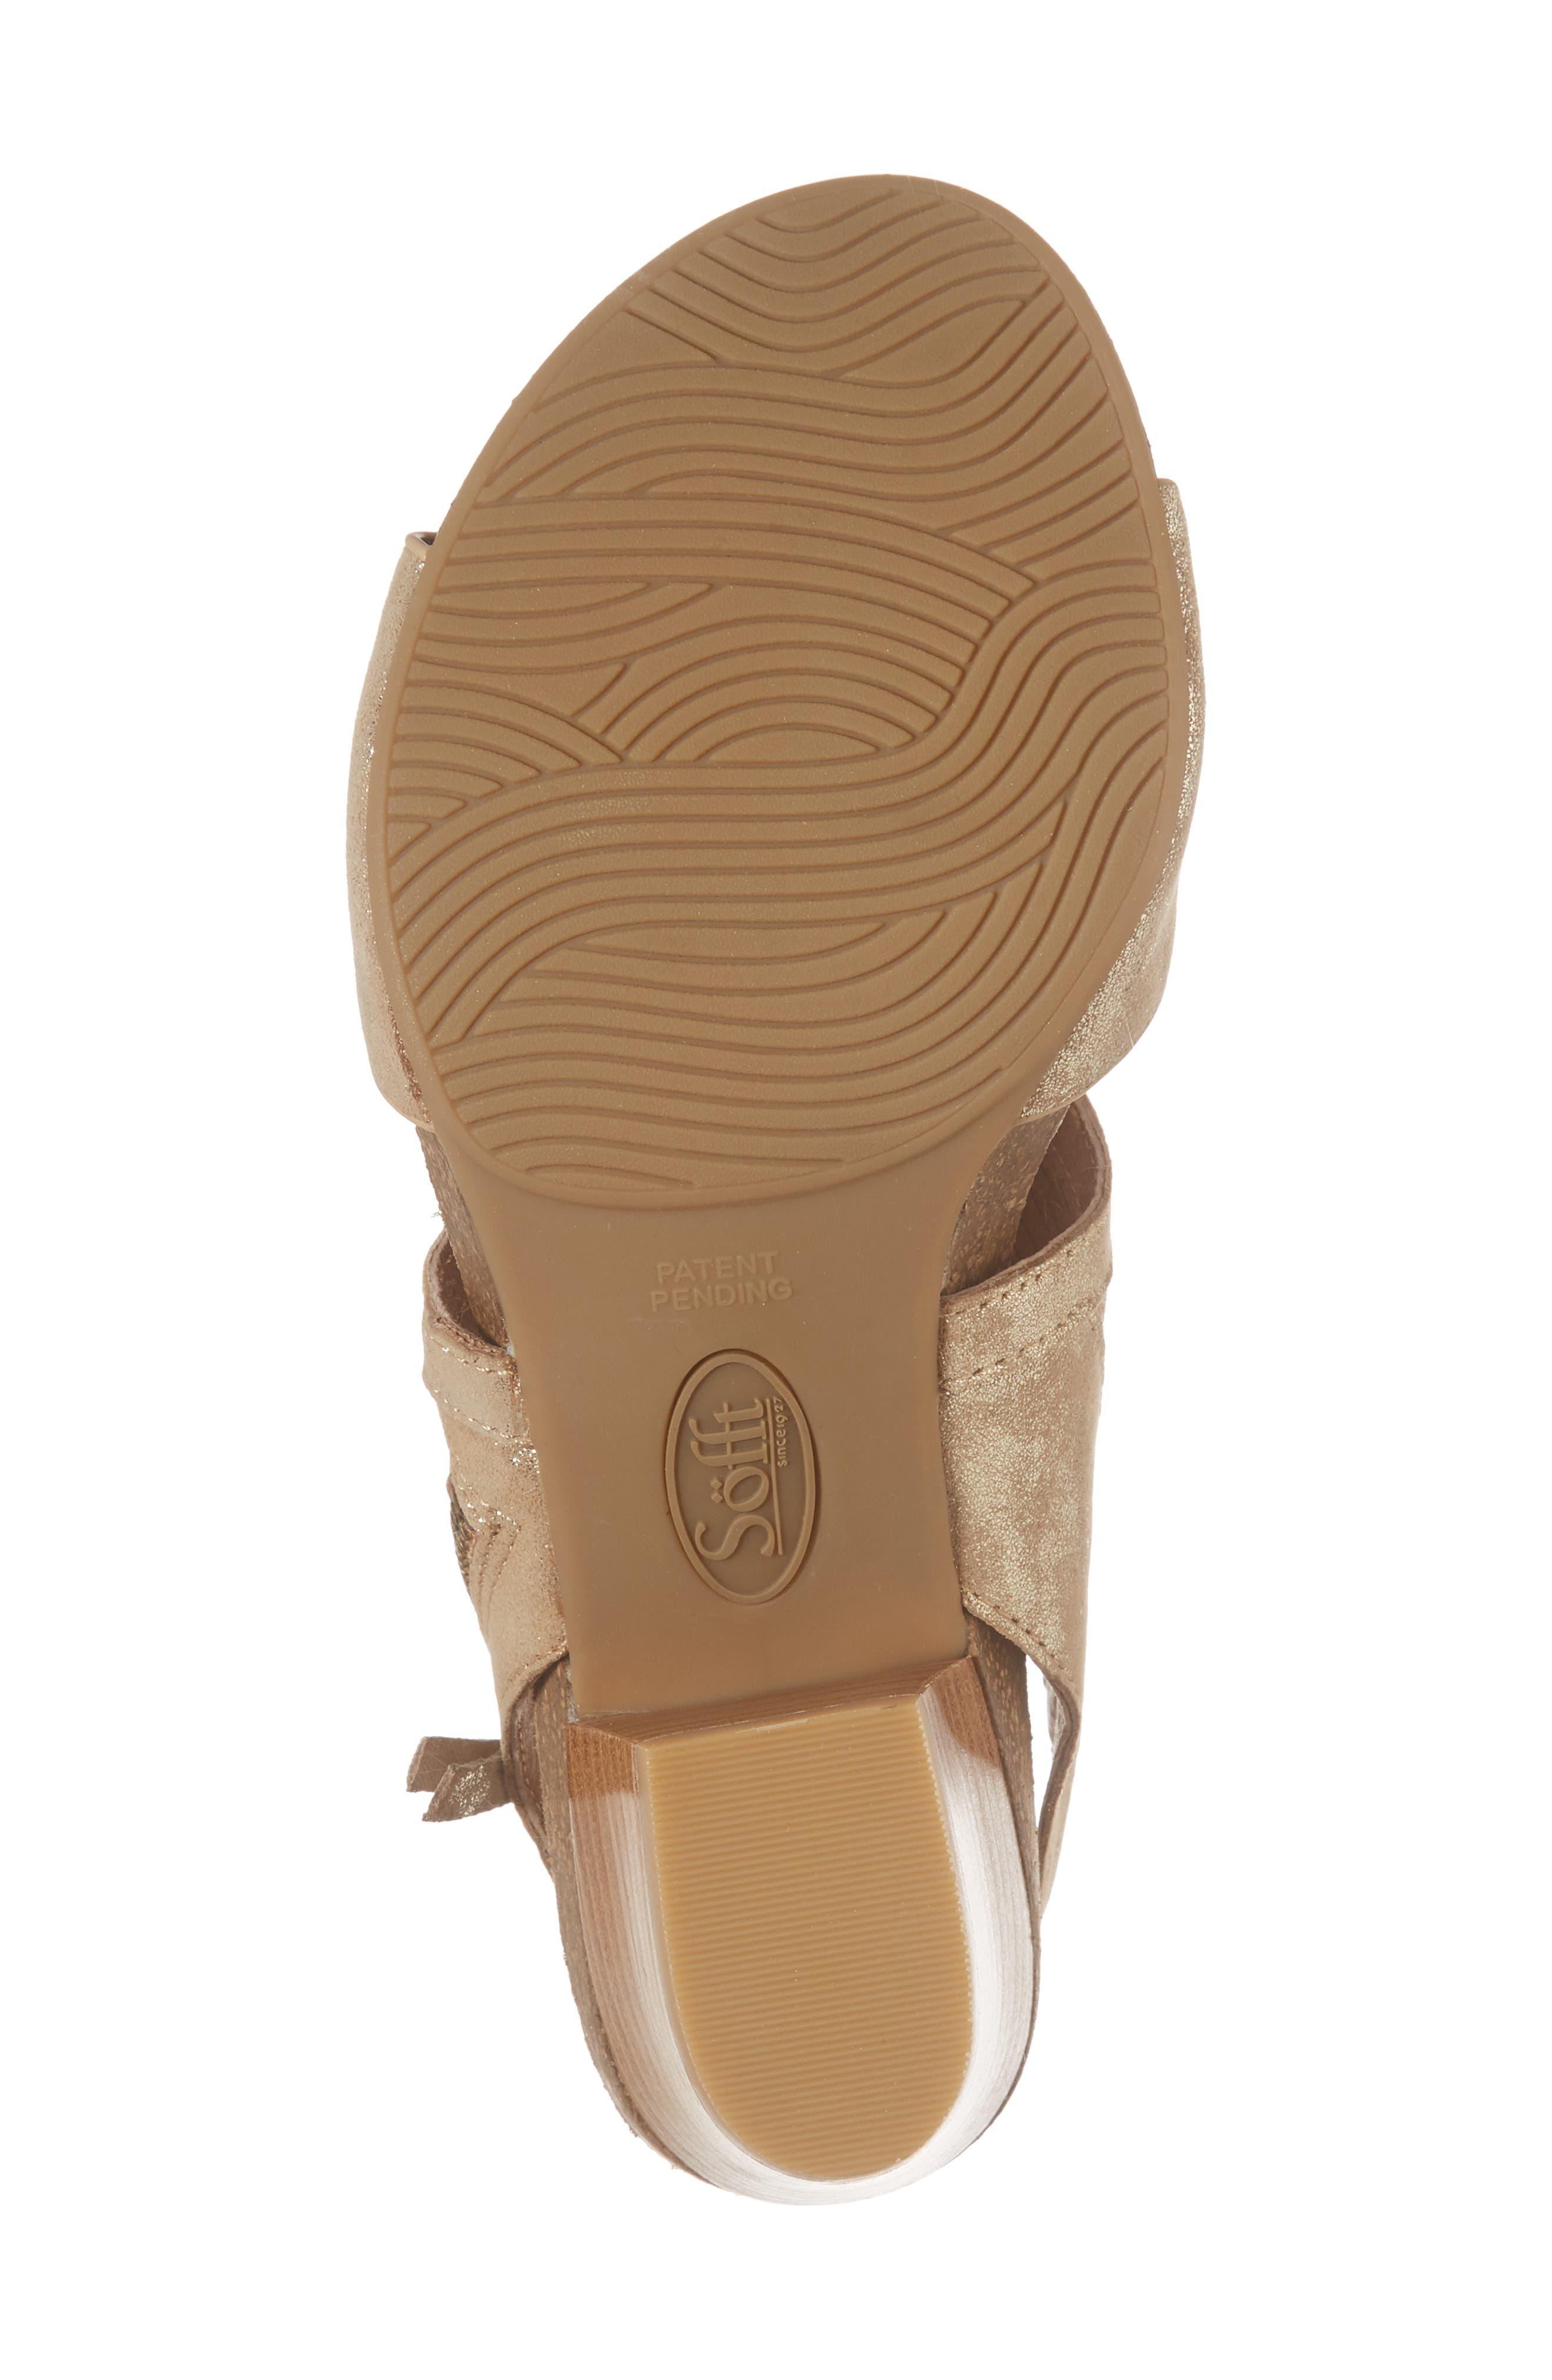 Milan Block Heel Sandal,                             Alternate thumbnail 6, color,                             040